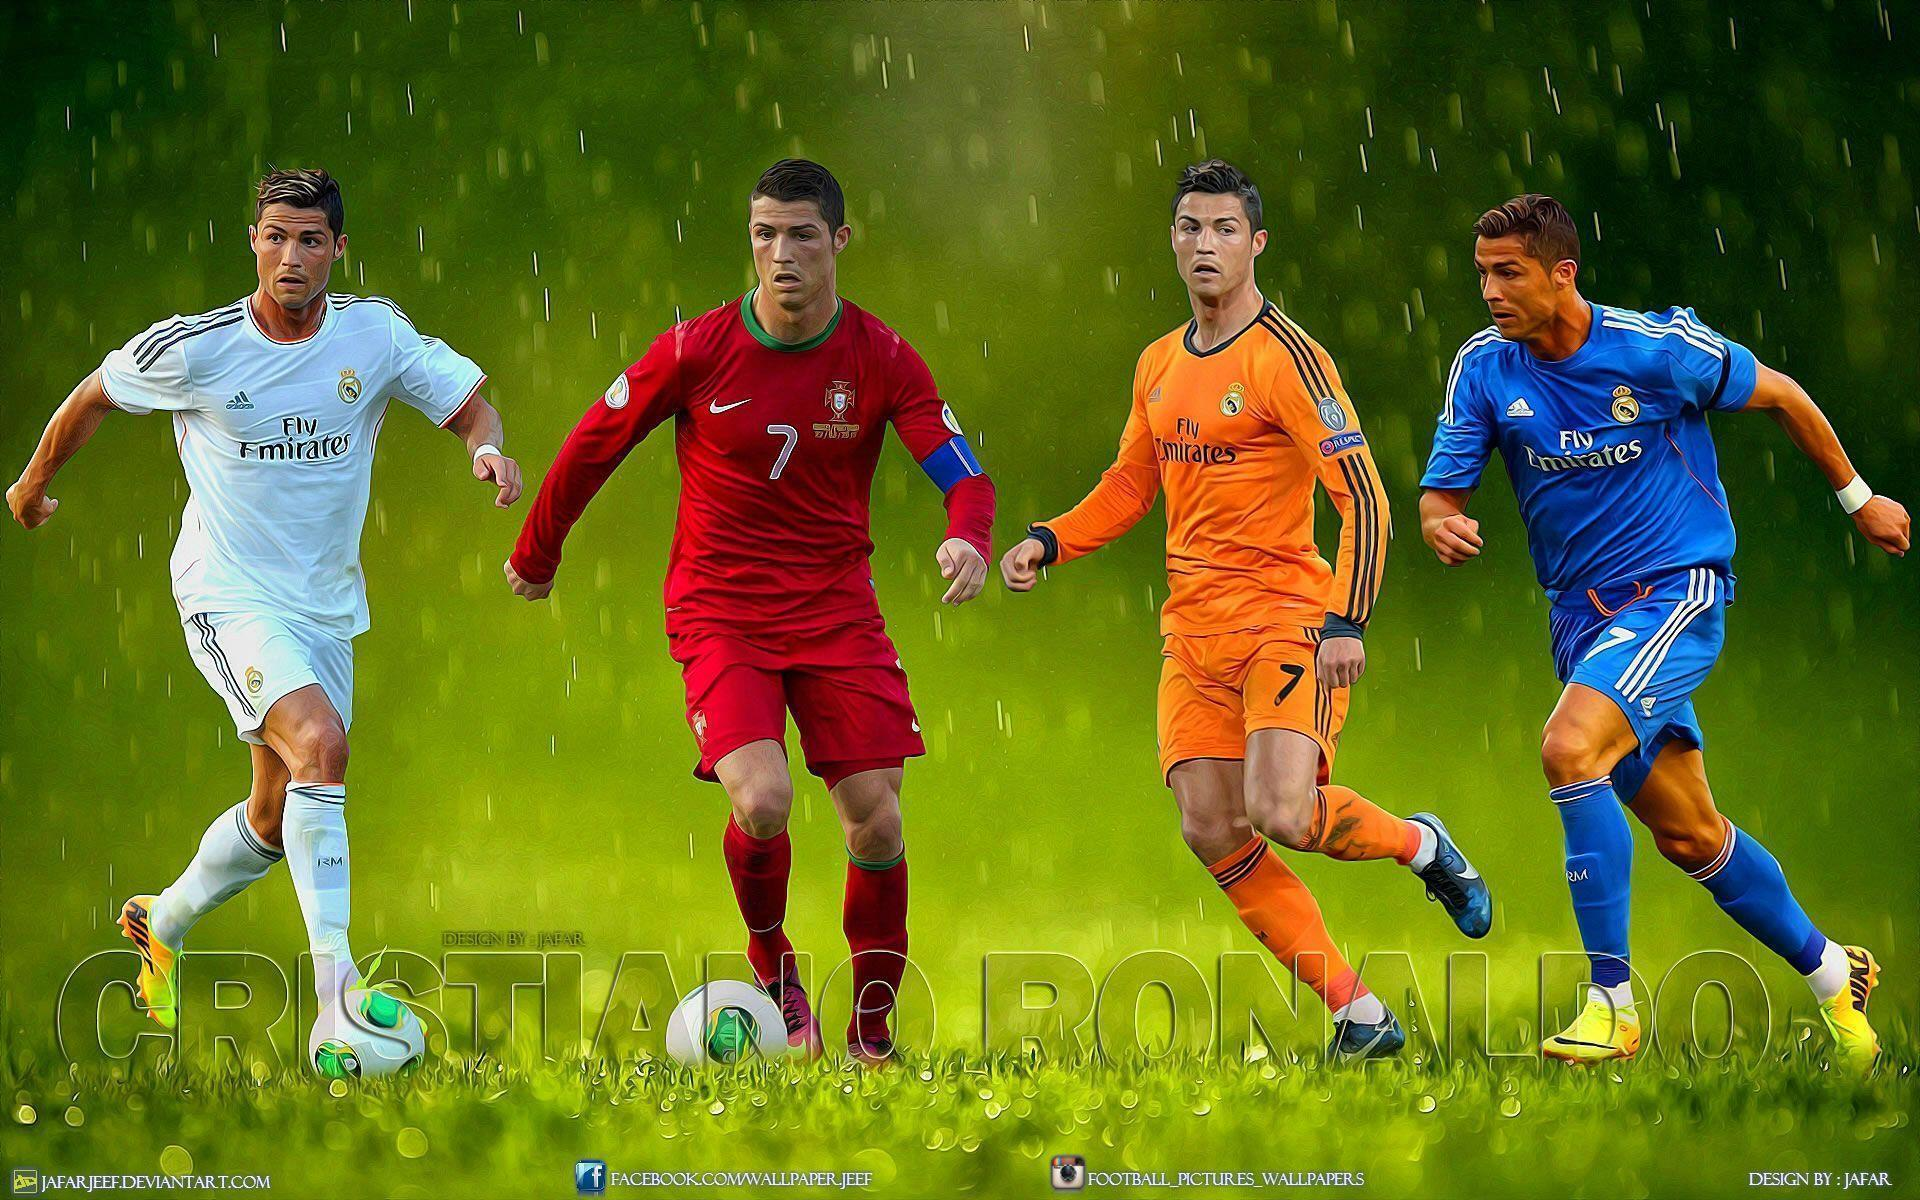 Ronaldo Vs Messi Wallpaper 2014 Messi 2016 Vs C...